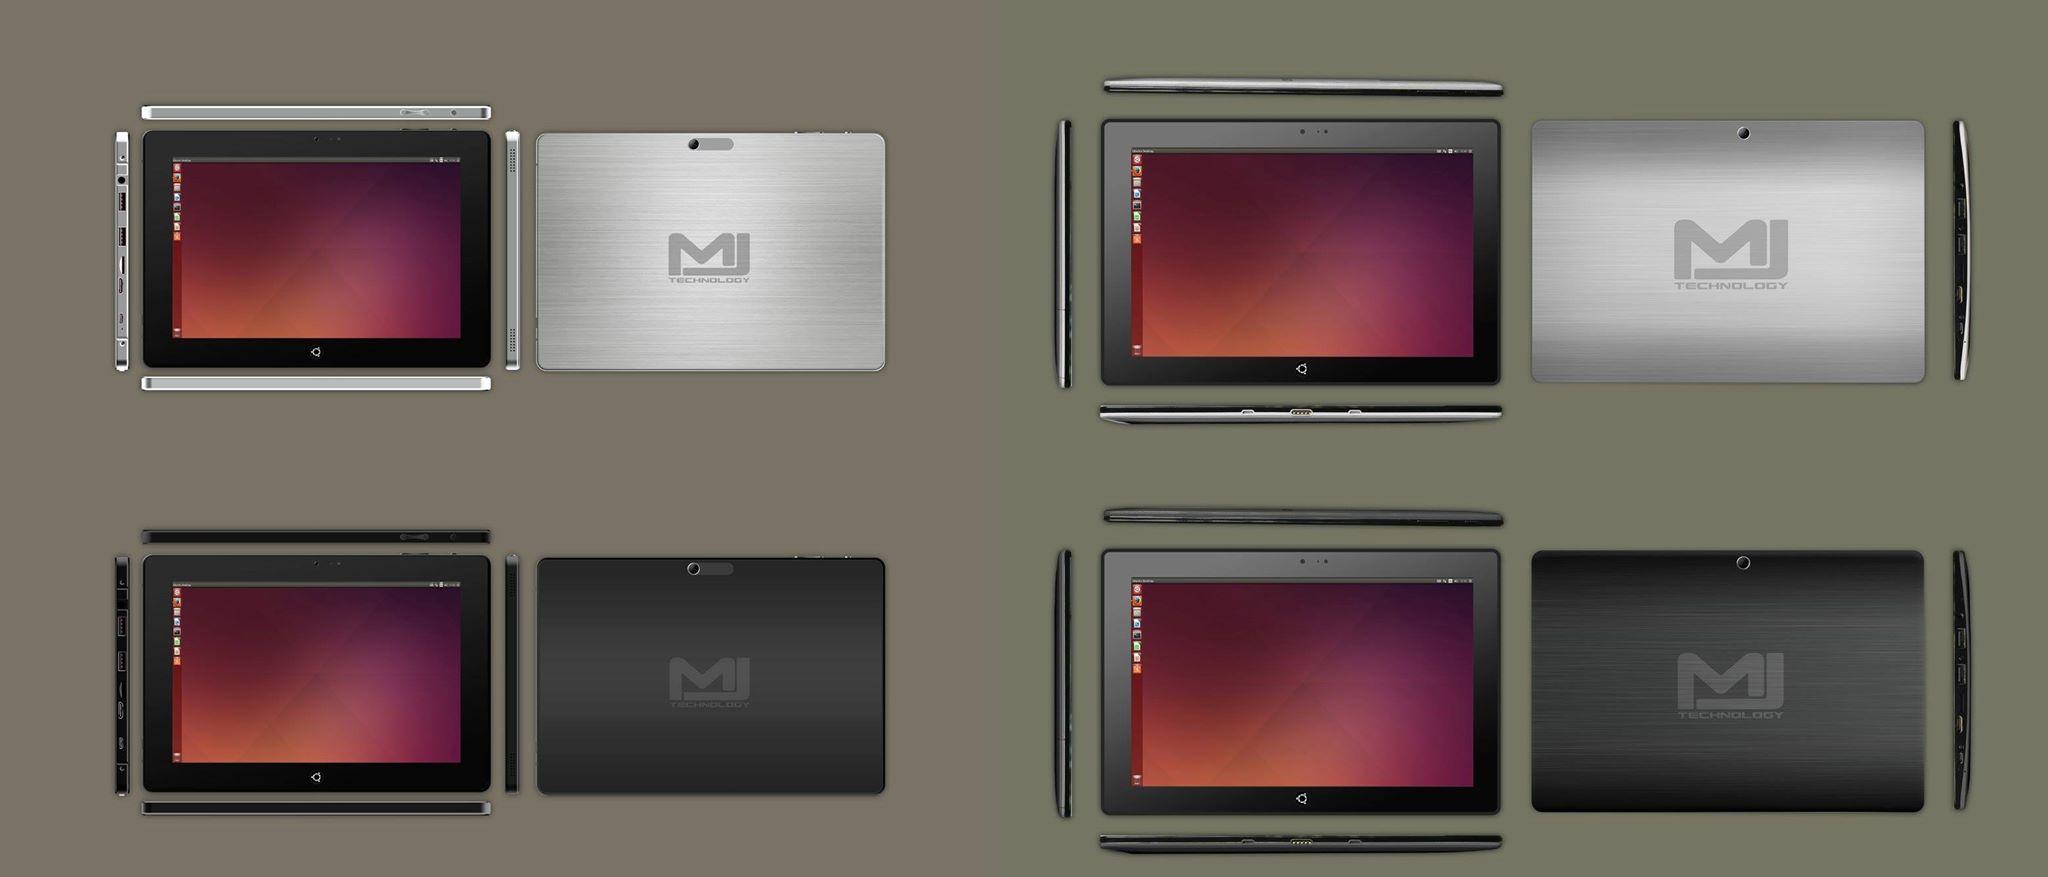 tablets con ubuntu